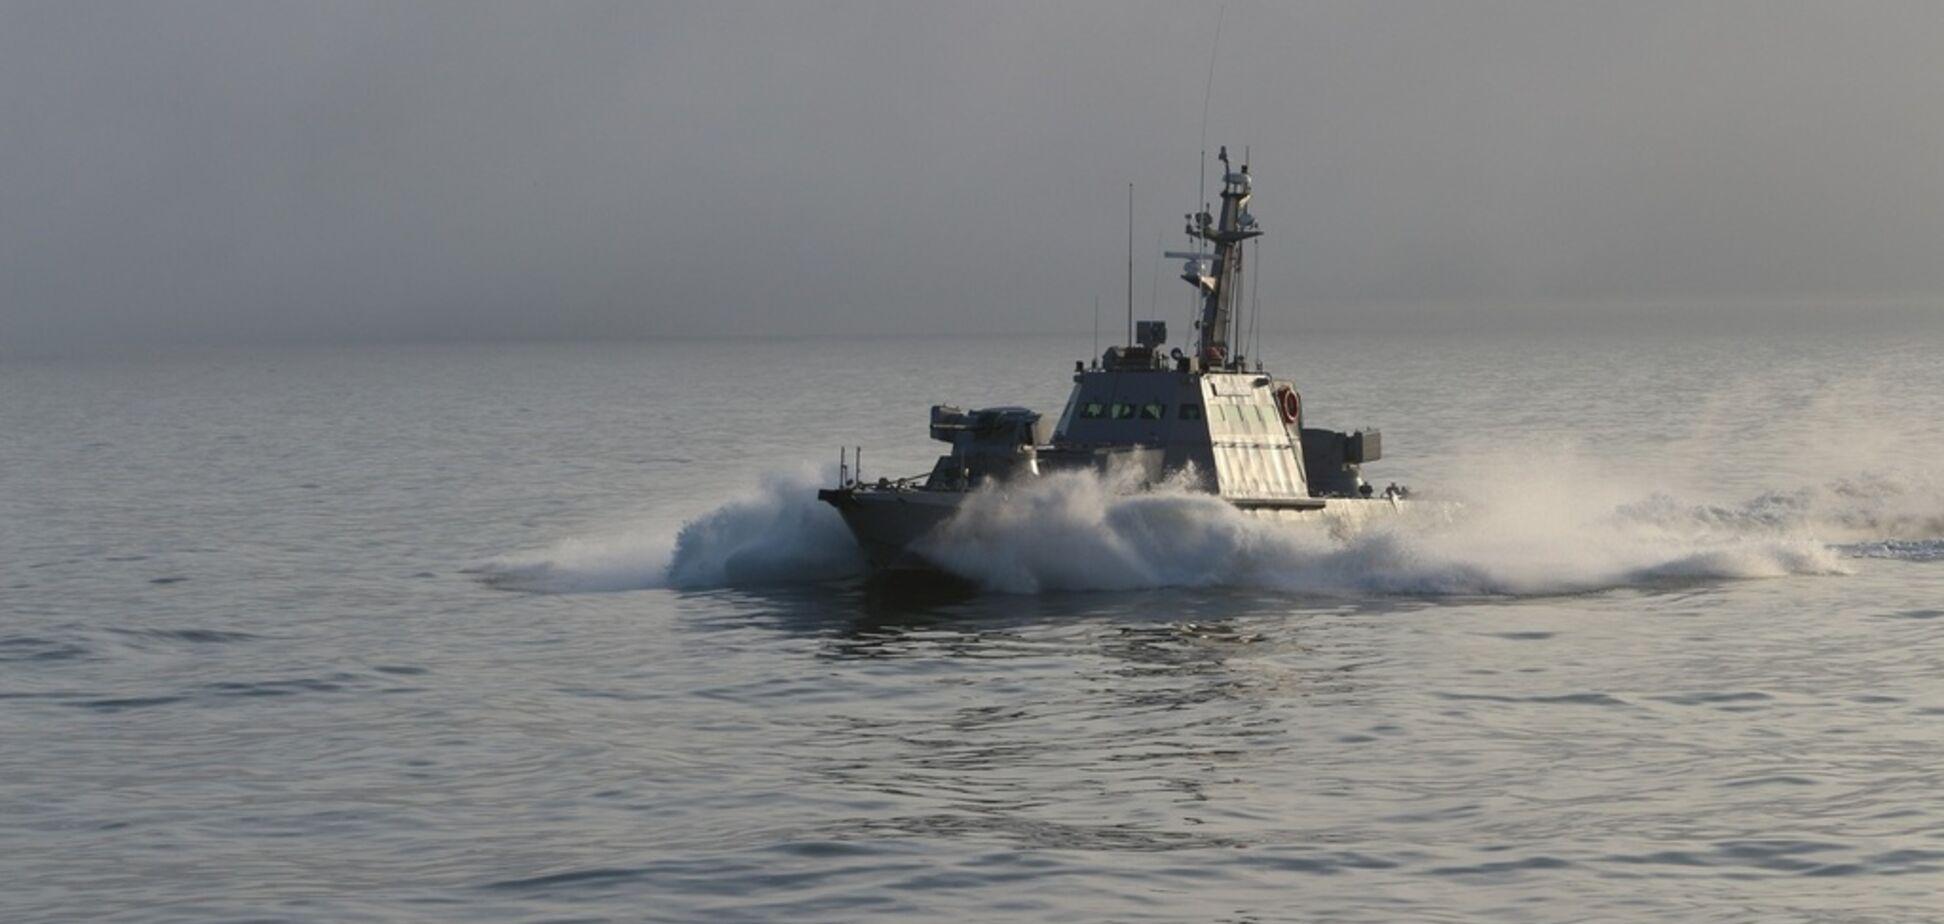 Украинские моряки отразили ''атаку'' на Азовском море: зрелищное видео